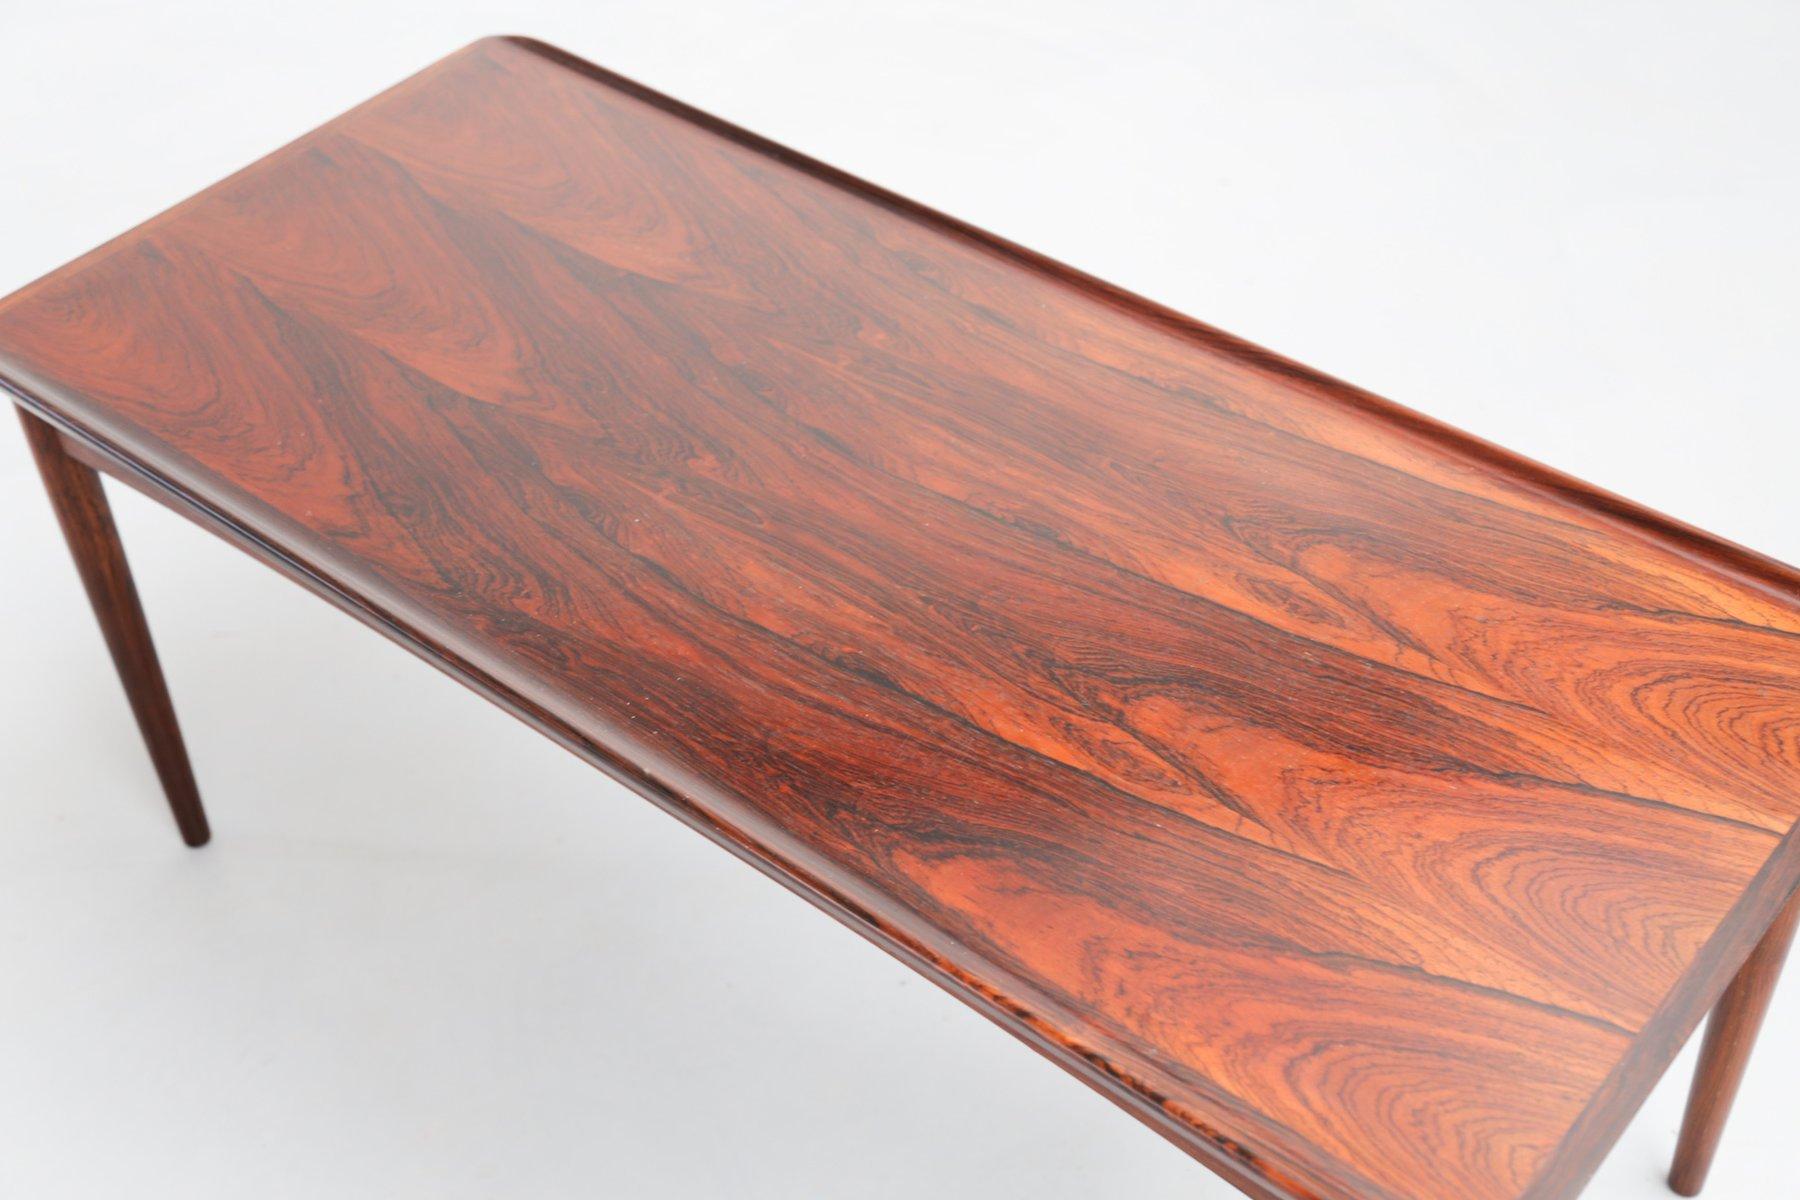 table basse en palissandre de rio danemark en vente sur. Black Bedroom Furniture Sets. Home Design Ideas